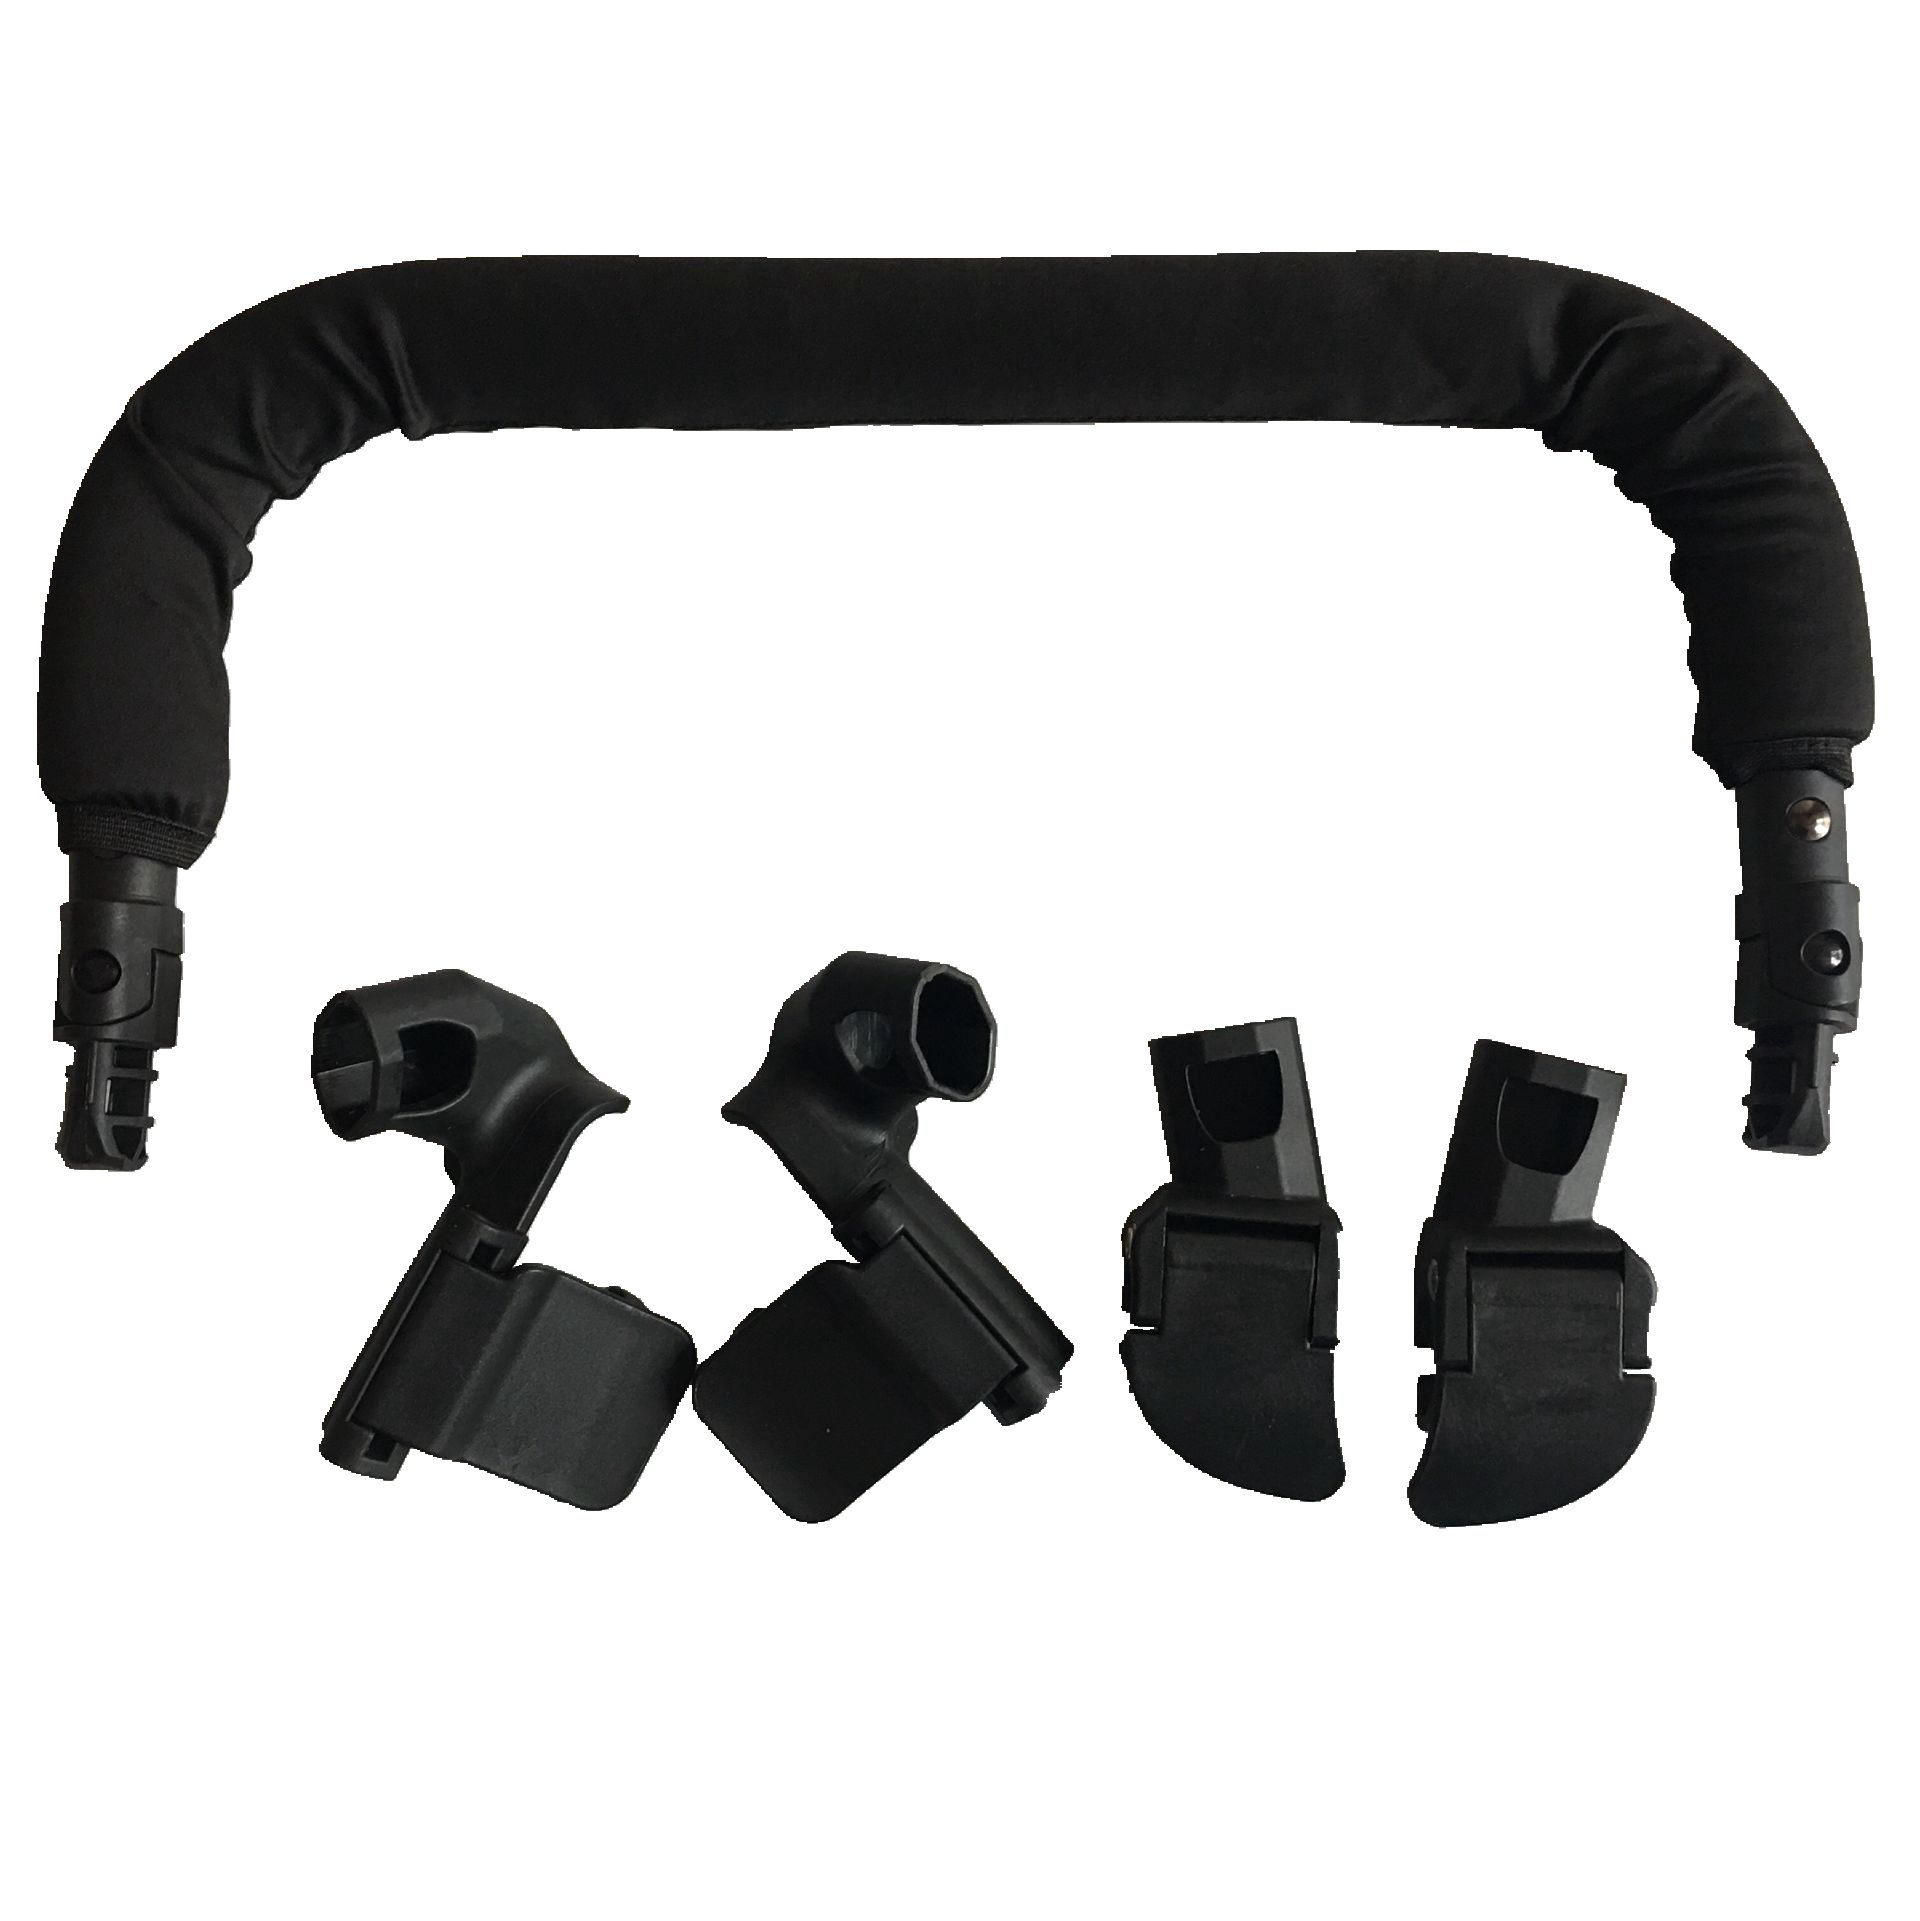 2018 Baby Stroller Armrest Bumper Bar Armrest Accessories Yoya YOYO Babythrone YOYO+ Install Bumper Joint Adapte